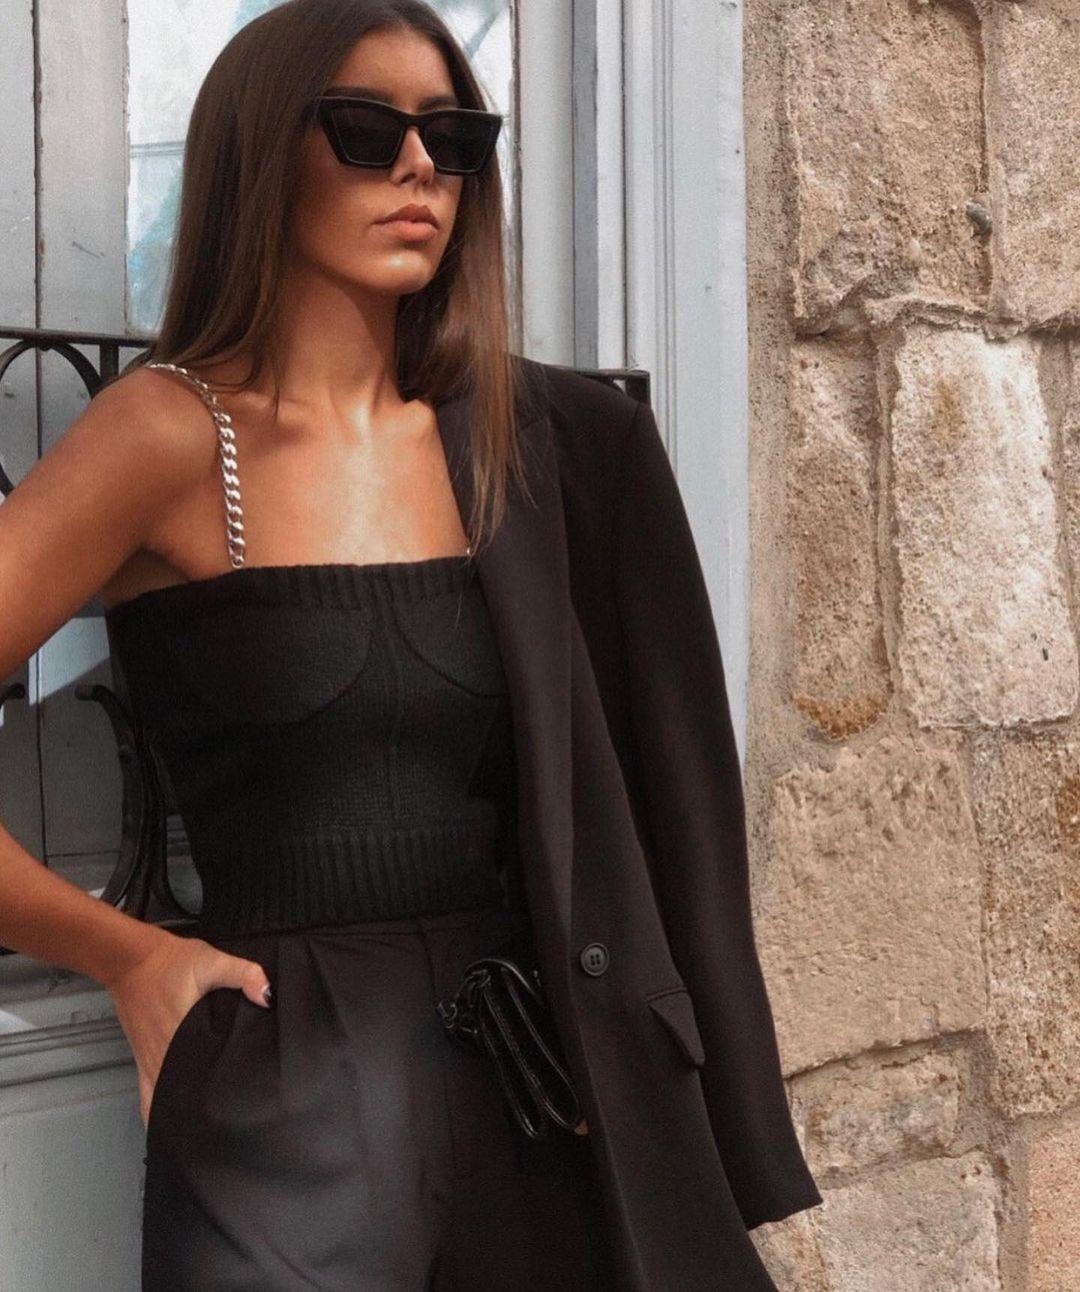 limited edition chain straps knit top de Zara sur zaraaddiction